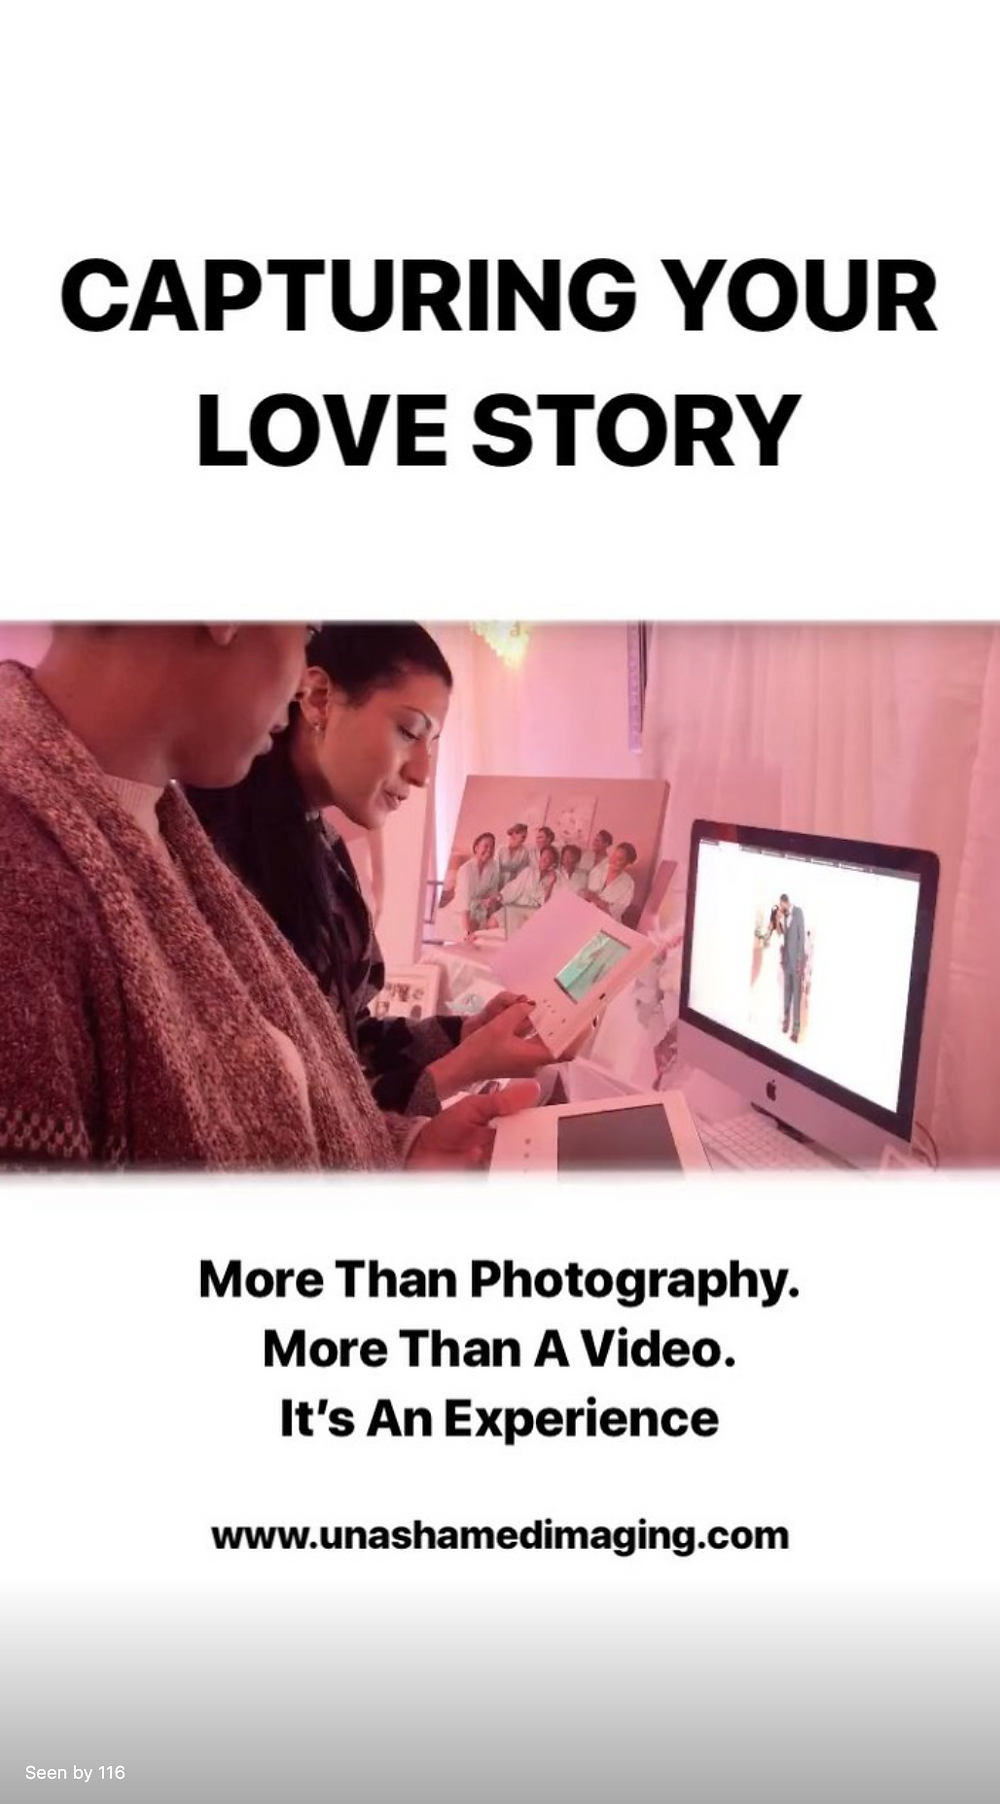 https://www.instagram.com/stories/highlights/17911671115048157/